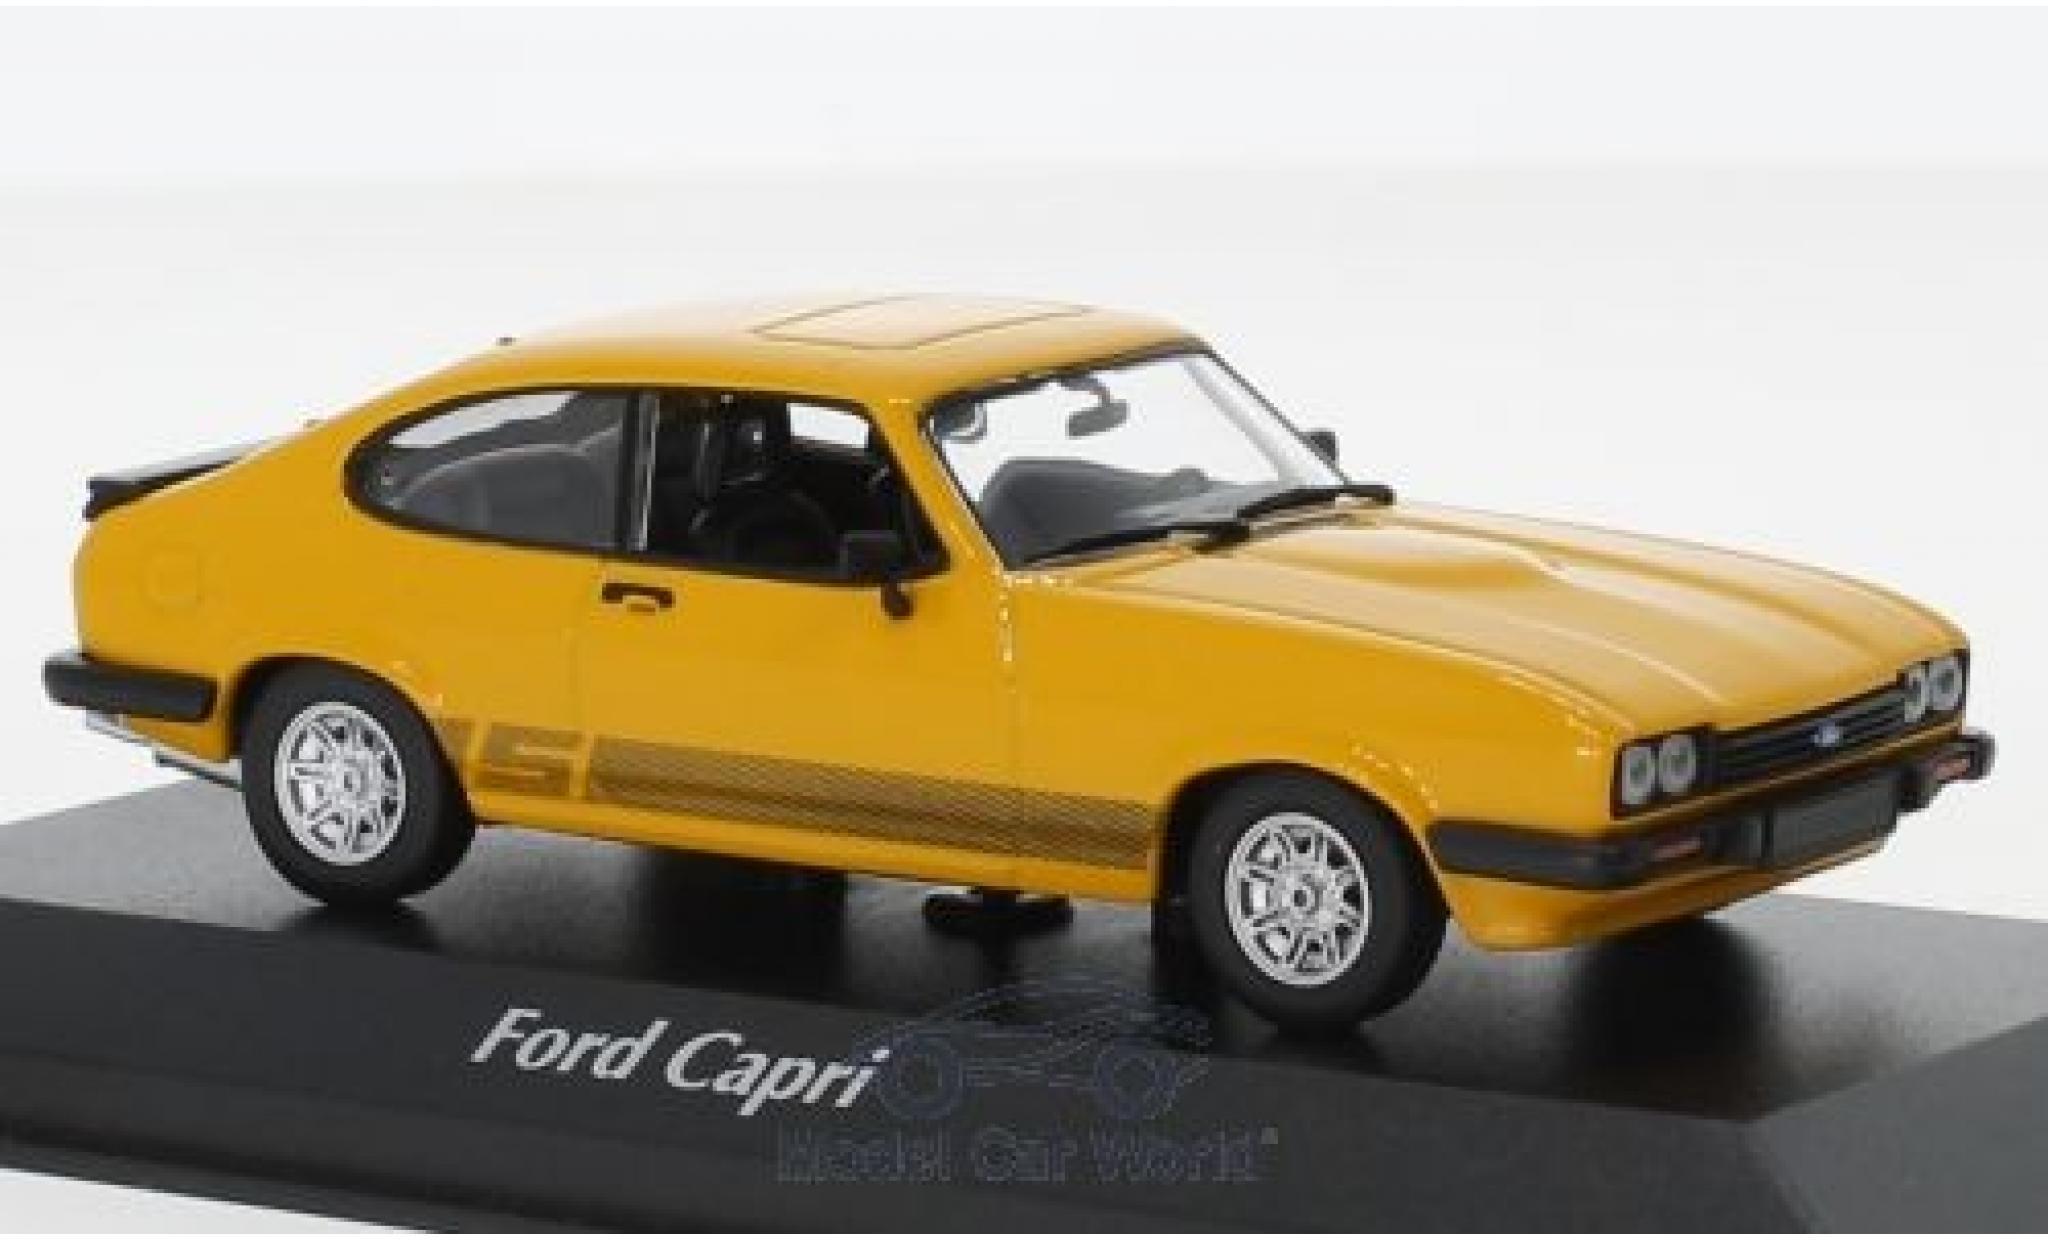 Ford Capri 1/43 Maxichamps MKIII 3.0 S jaune 1982